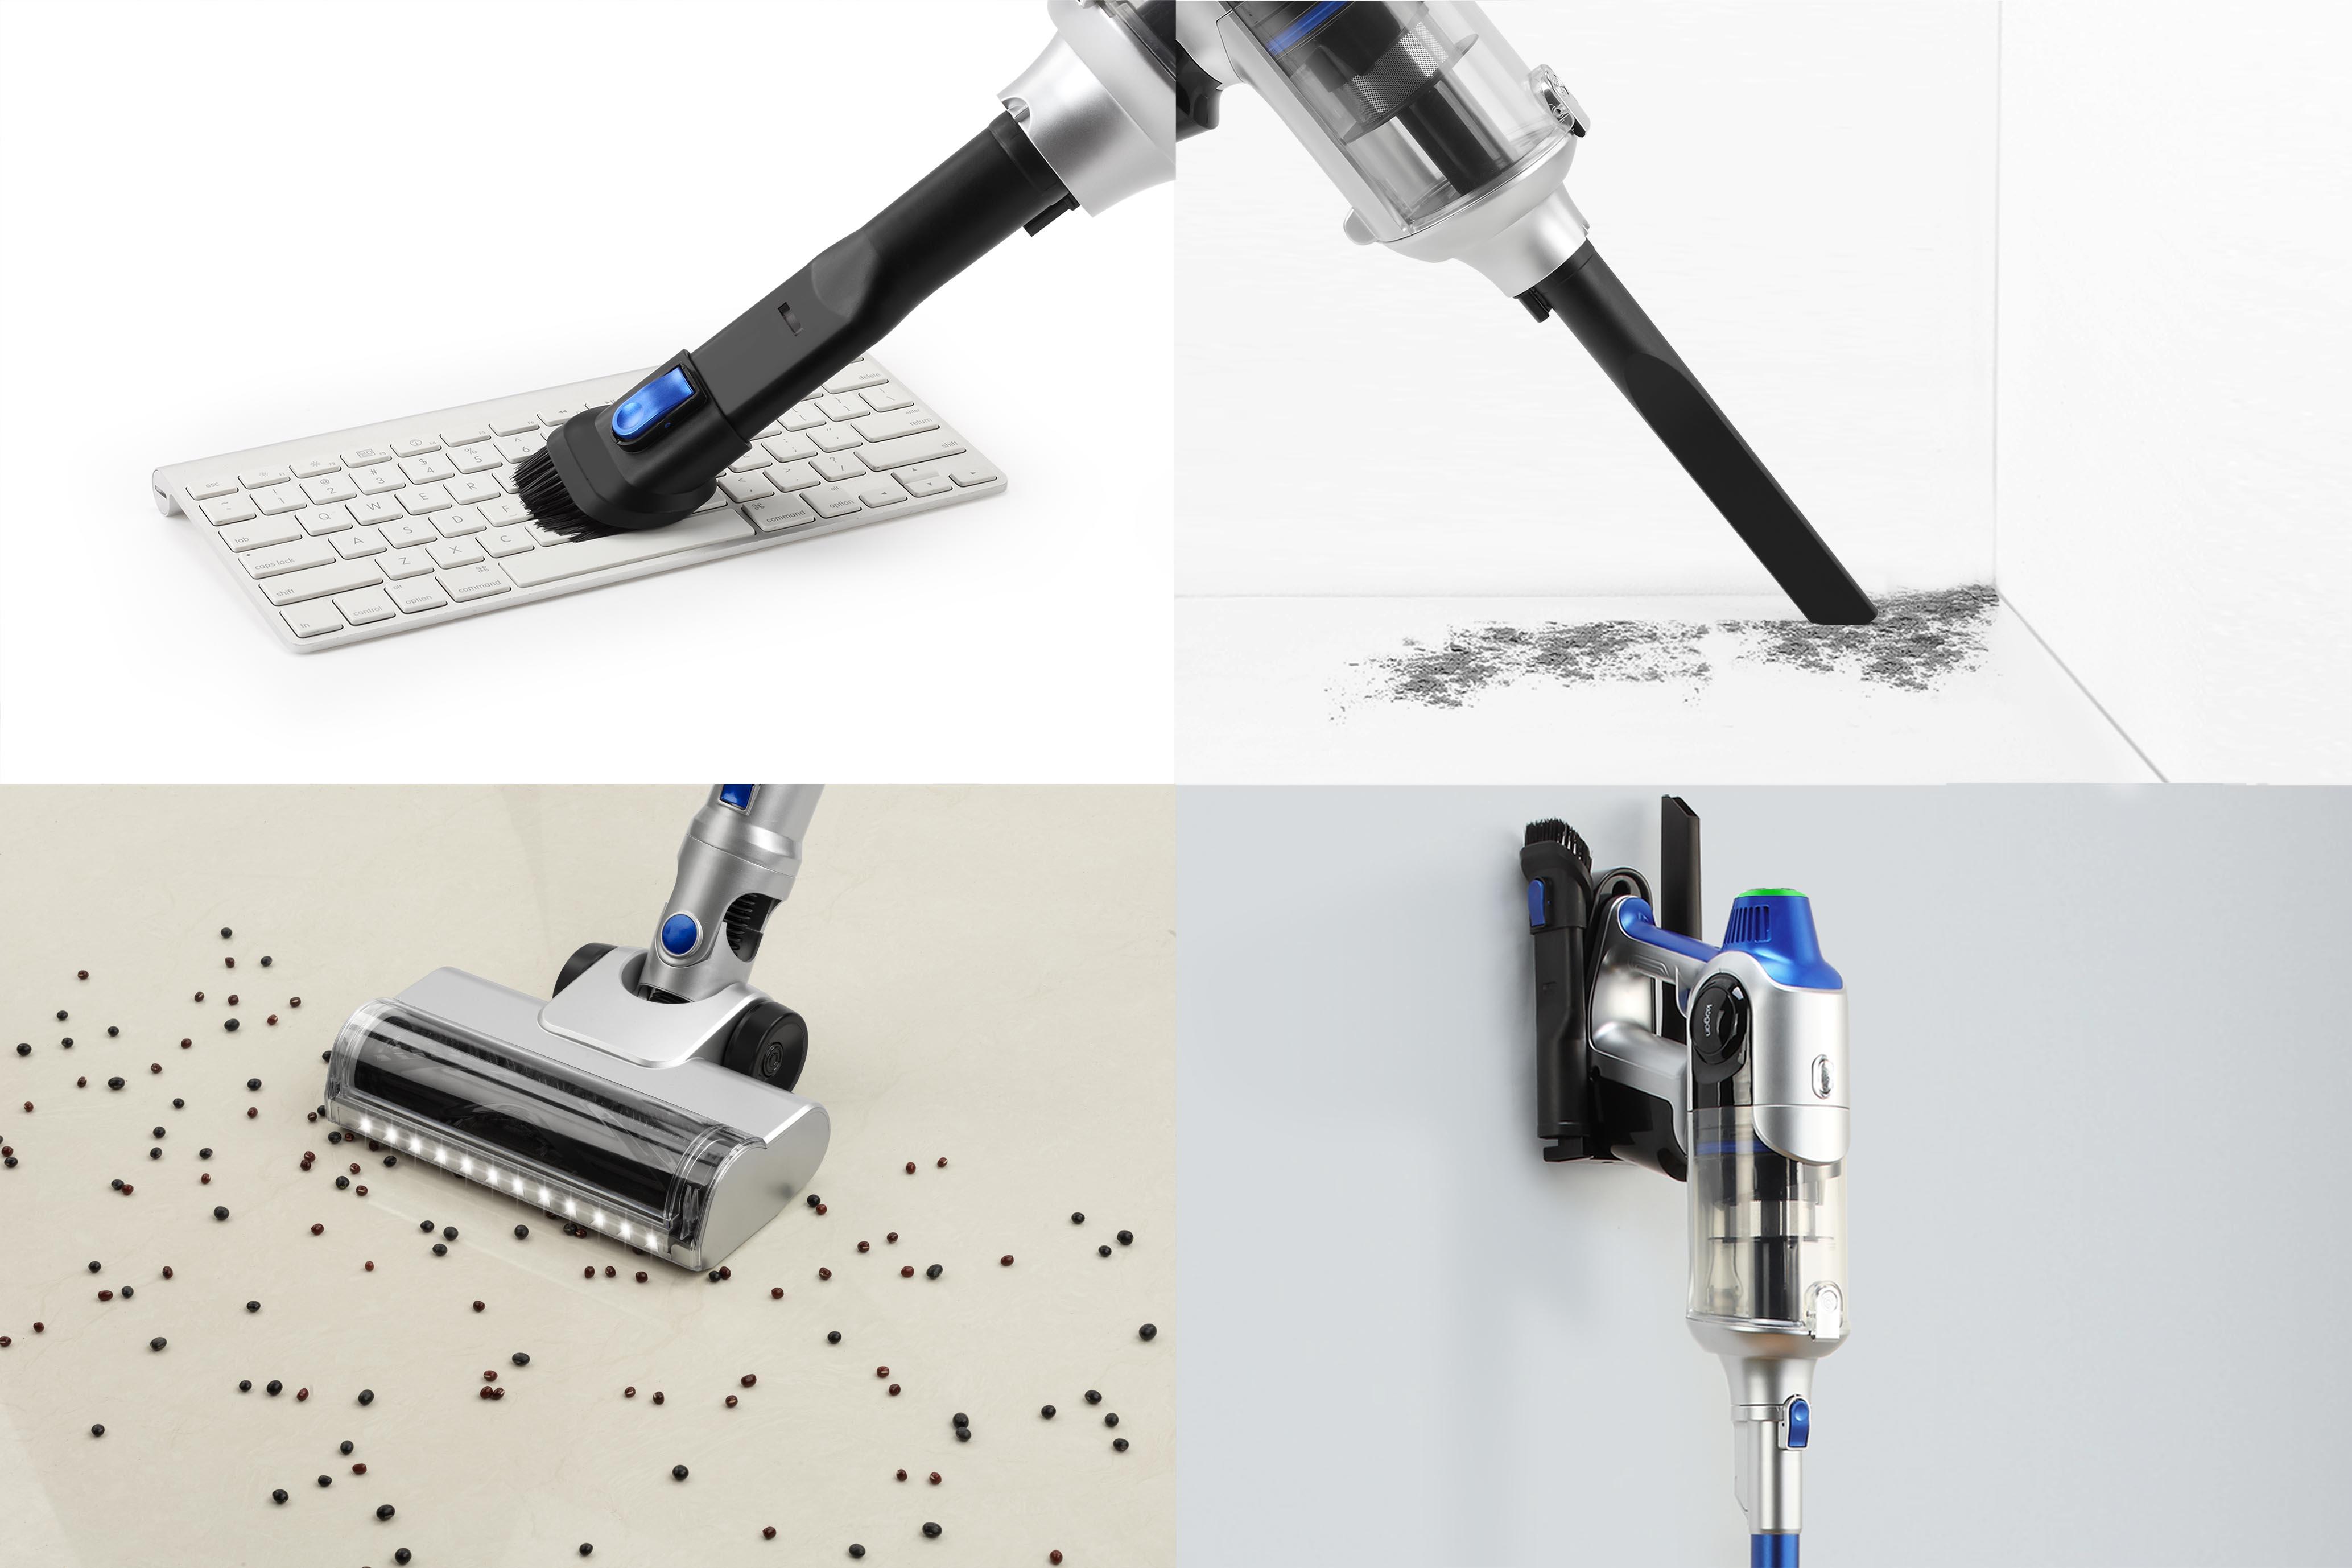 Multipurpose vacuuming